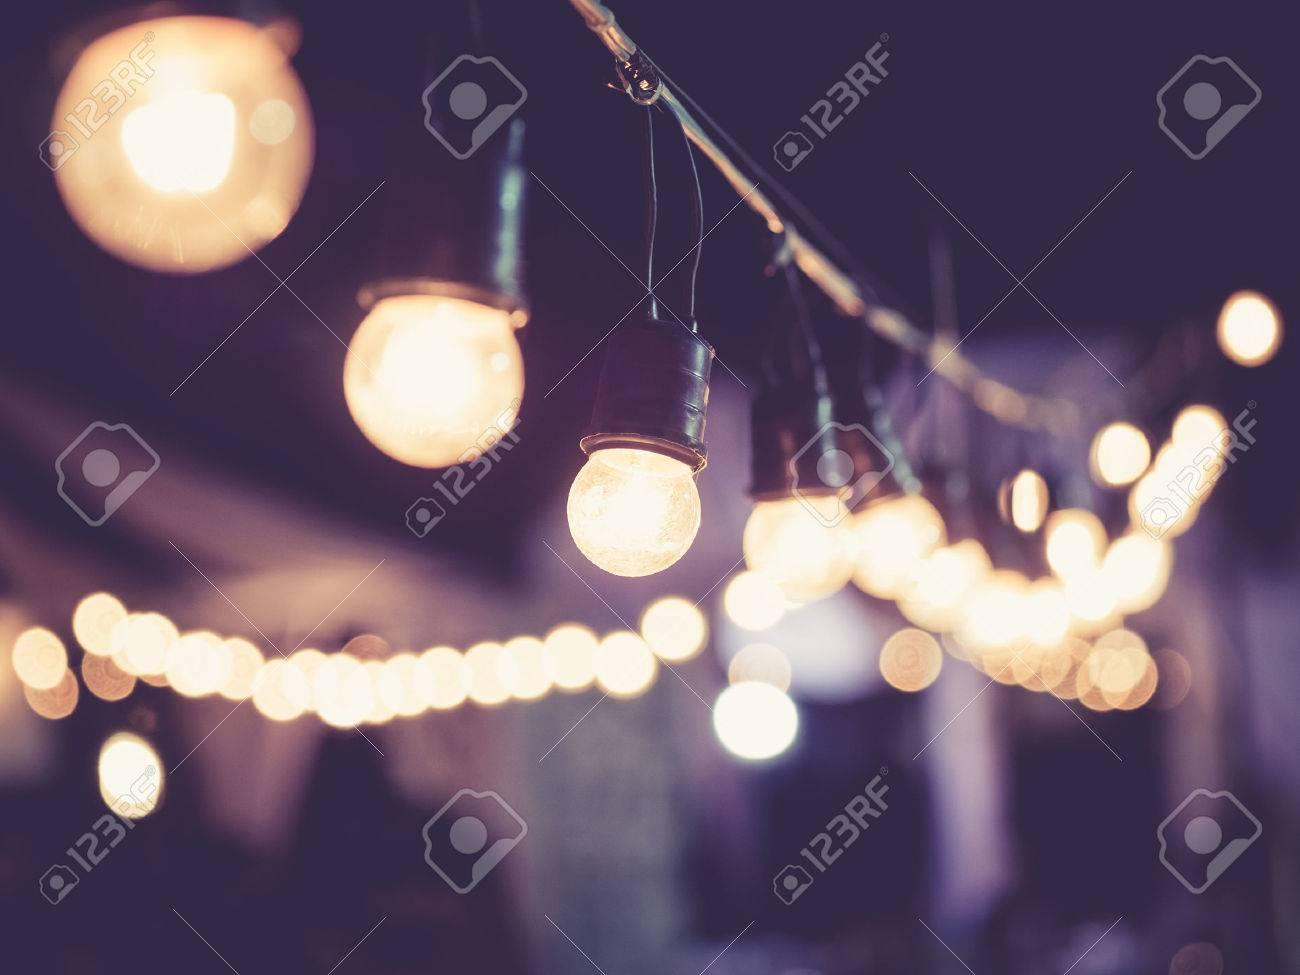 Lights decoration Event Festival outdoor Vintage tone - 53630122